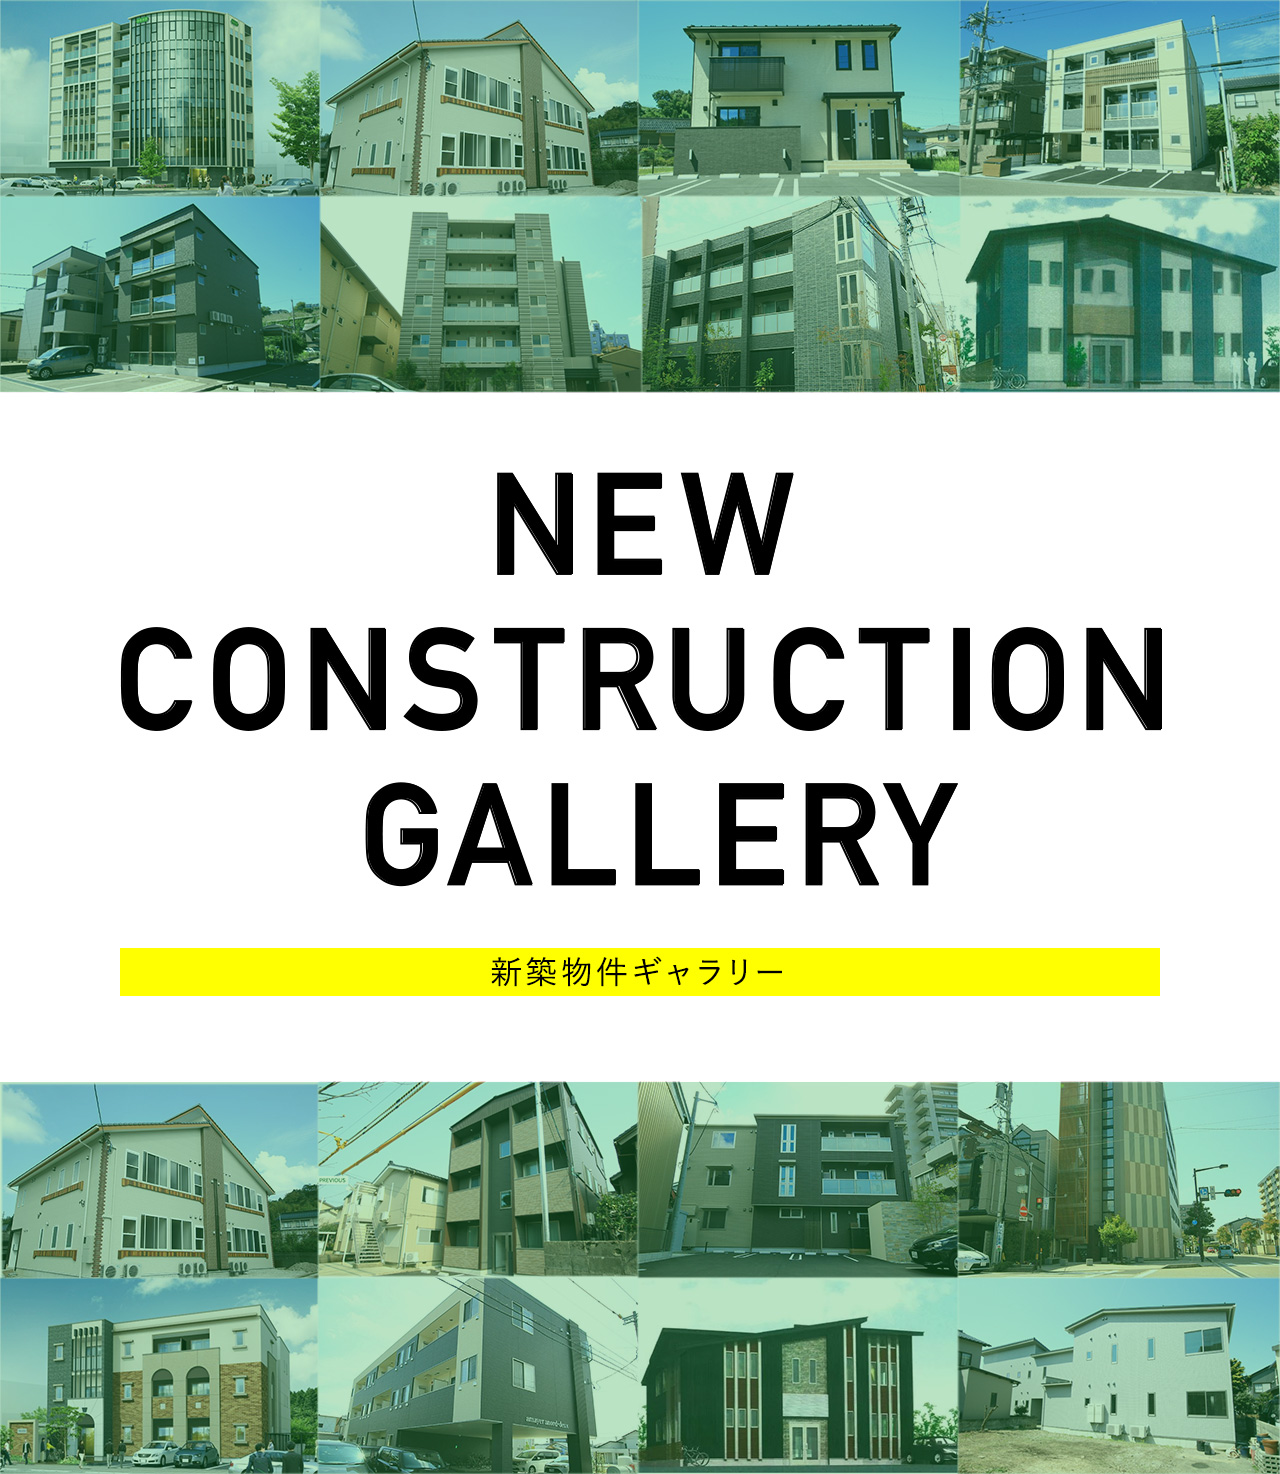 NEW CONSTRUCTION GALLERY 新築物件ギャラリー